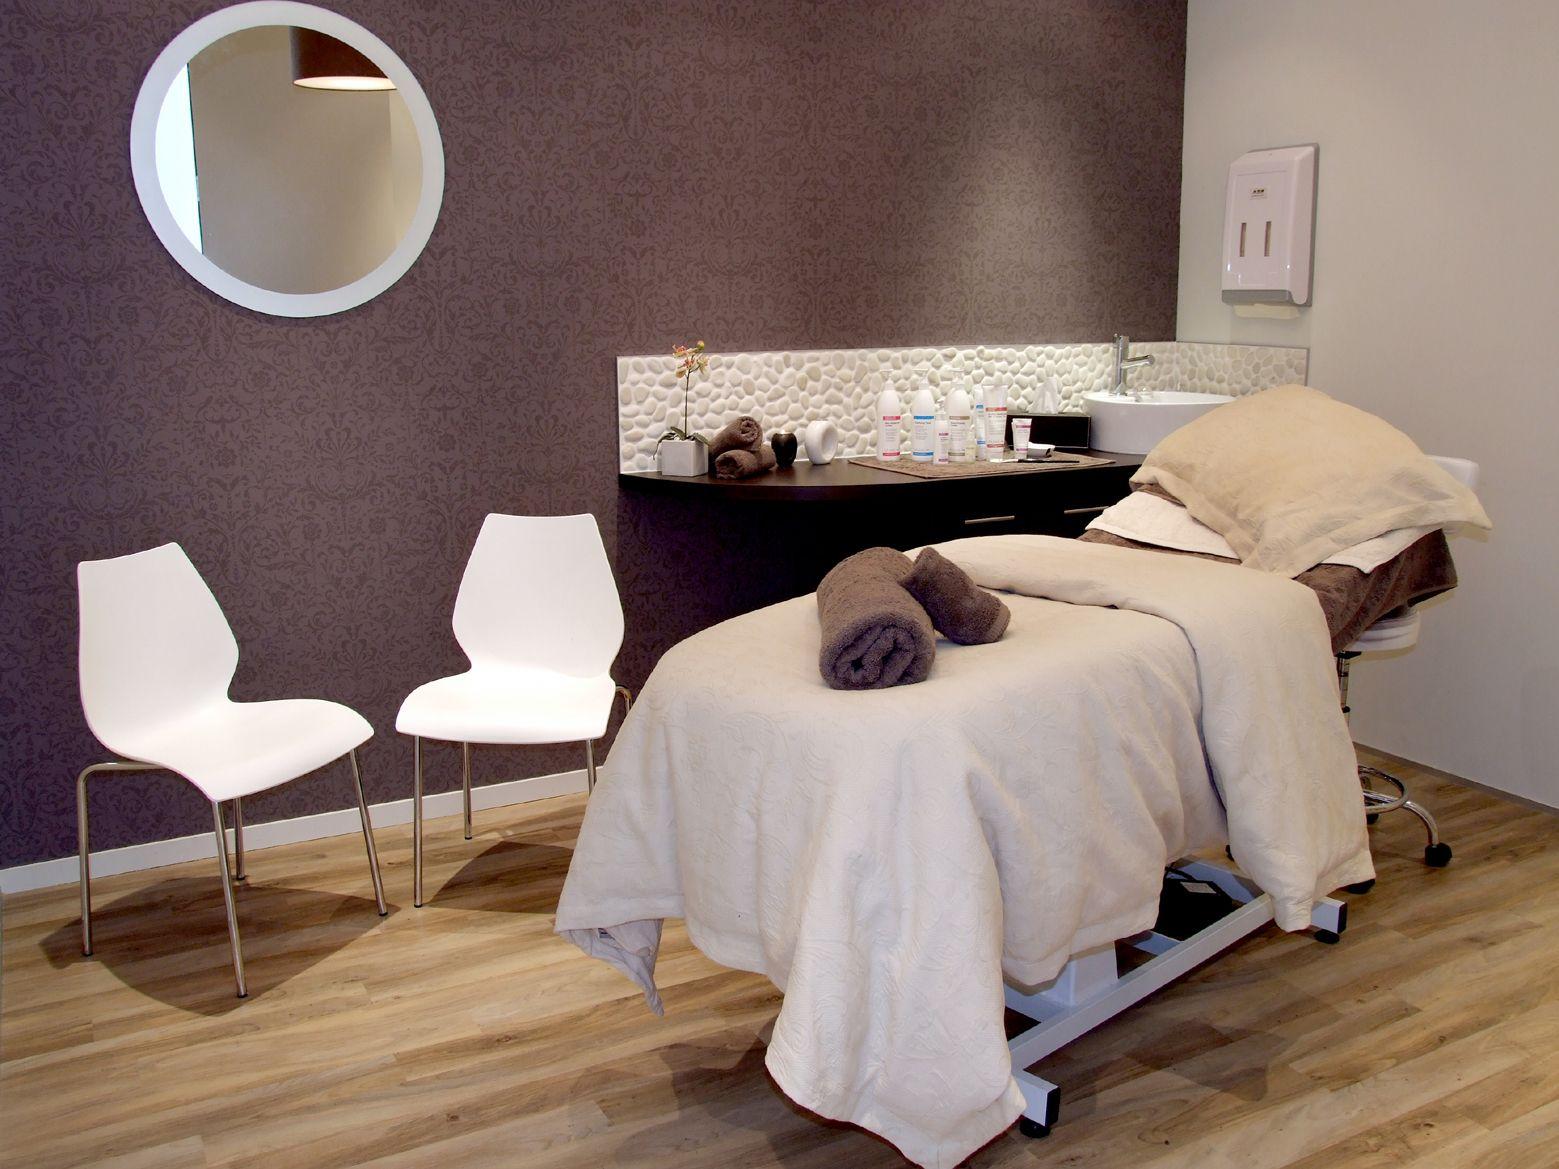 Esthetician Room Decor Spa Treatments